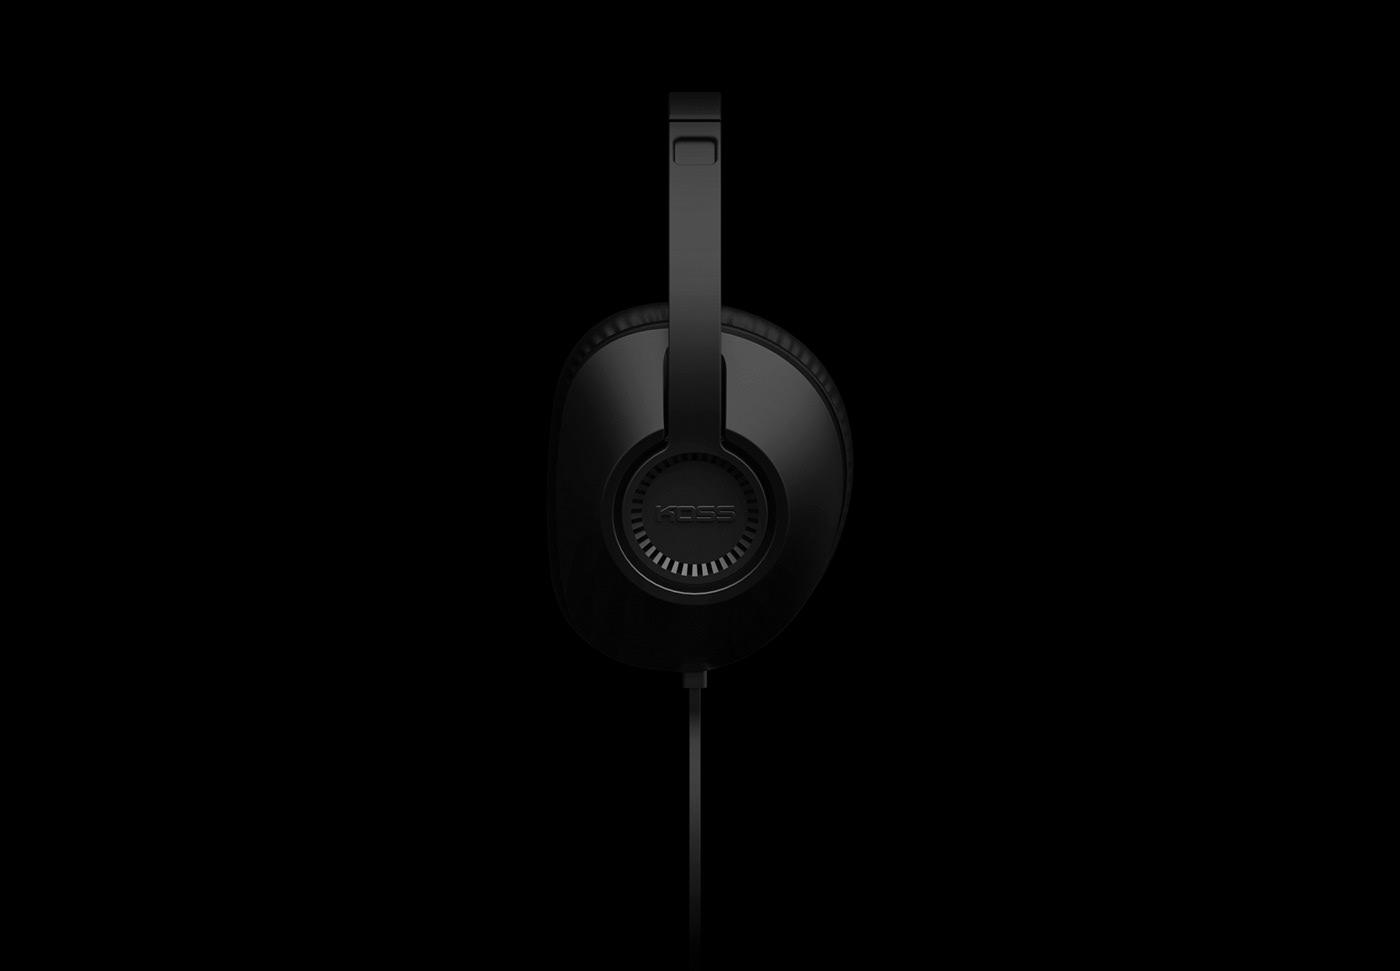 KOSS UR23 headphones consumer electronics